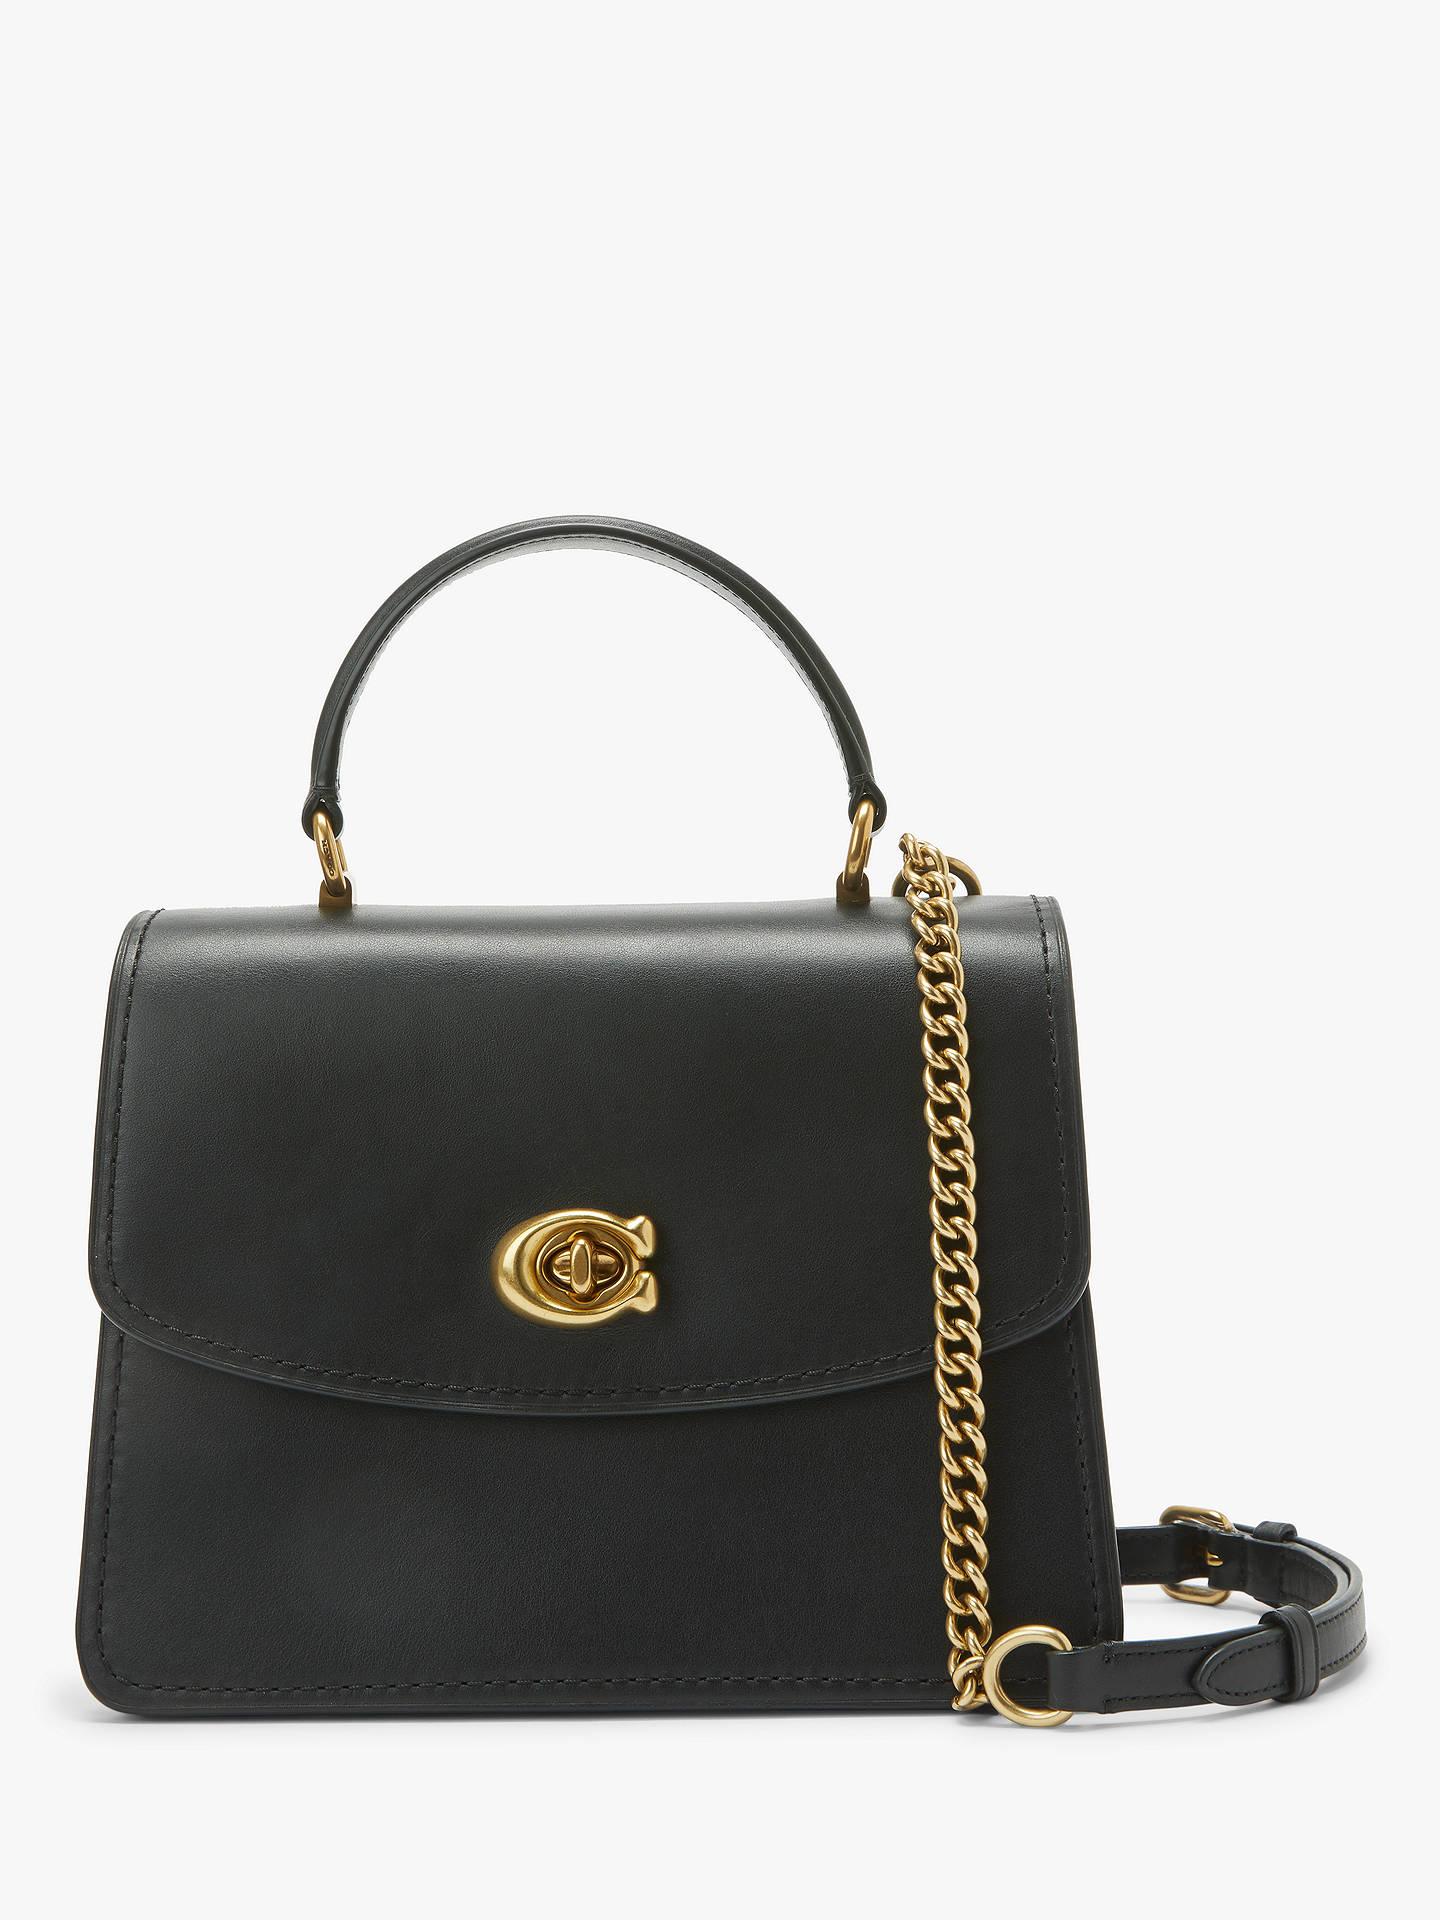 ffa8c82f8a Buy Coach Parker Leather Top Handle Shoulder Bag